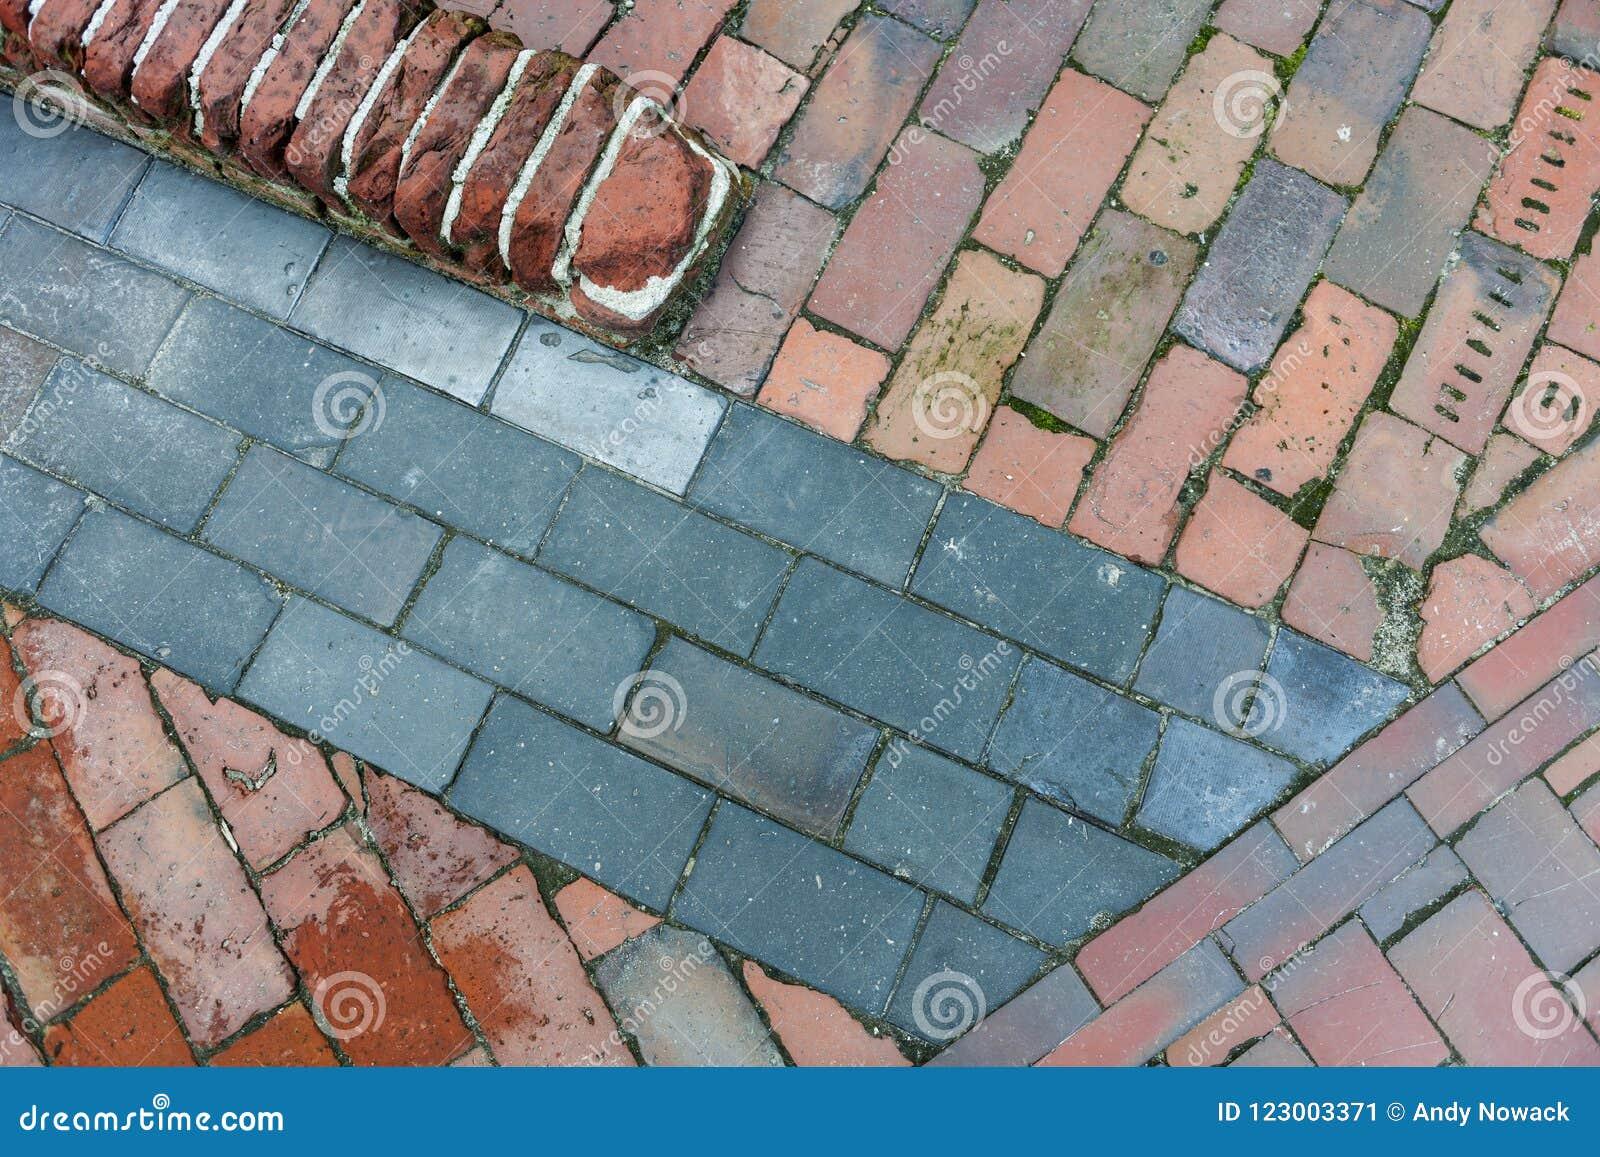 Arrangement of paving slabs 96